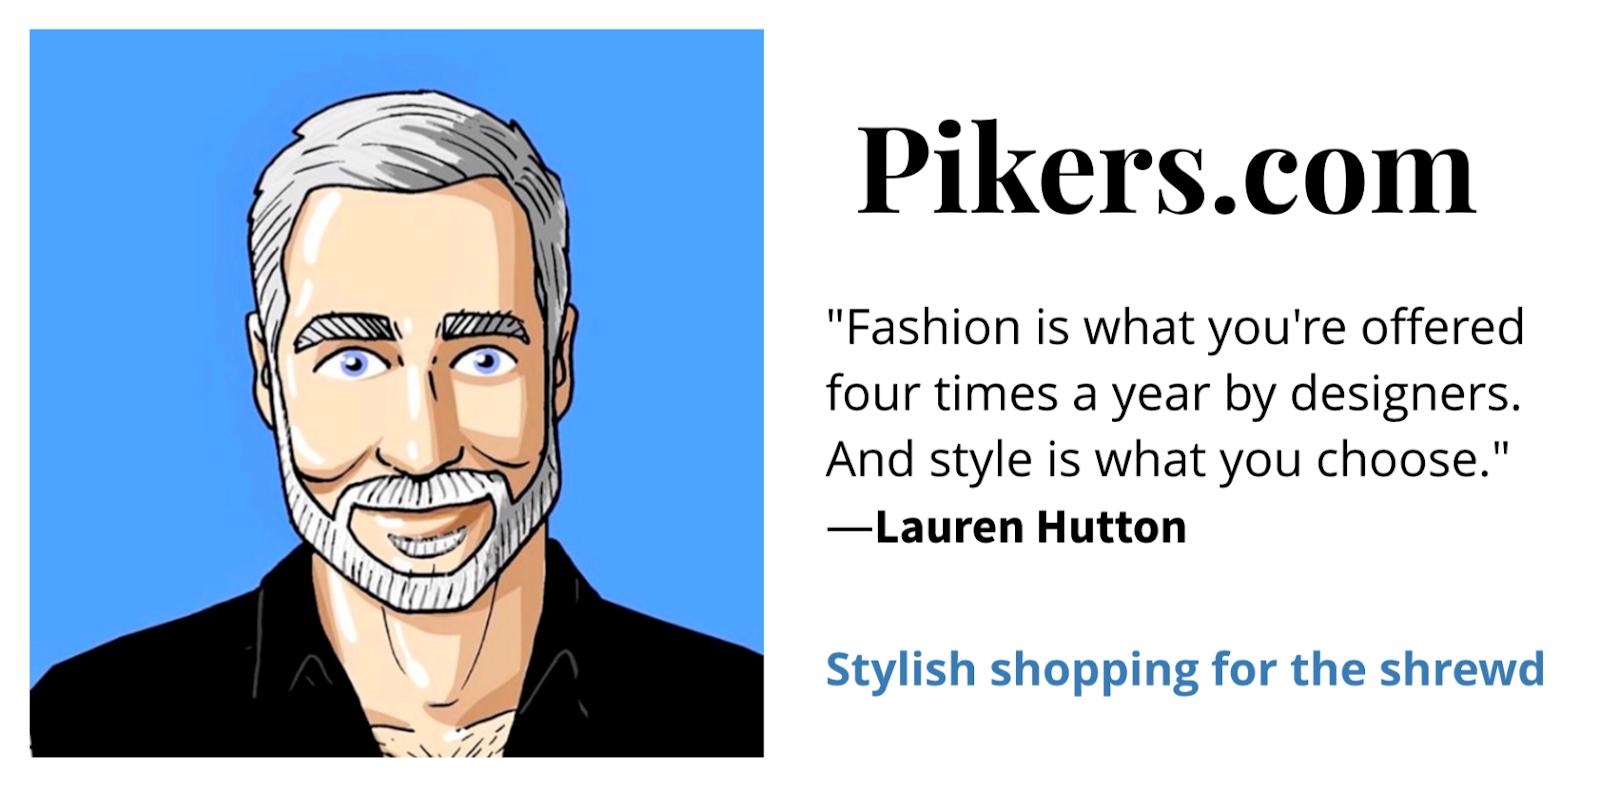 Pikers.com